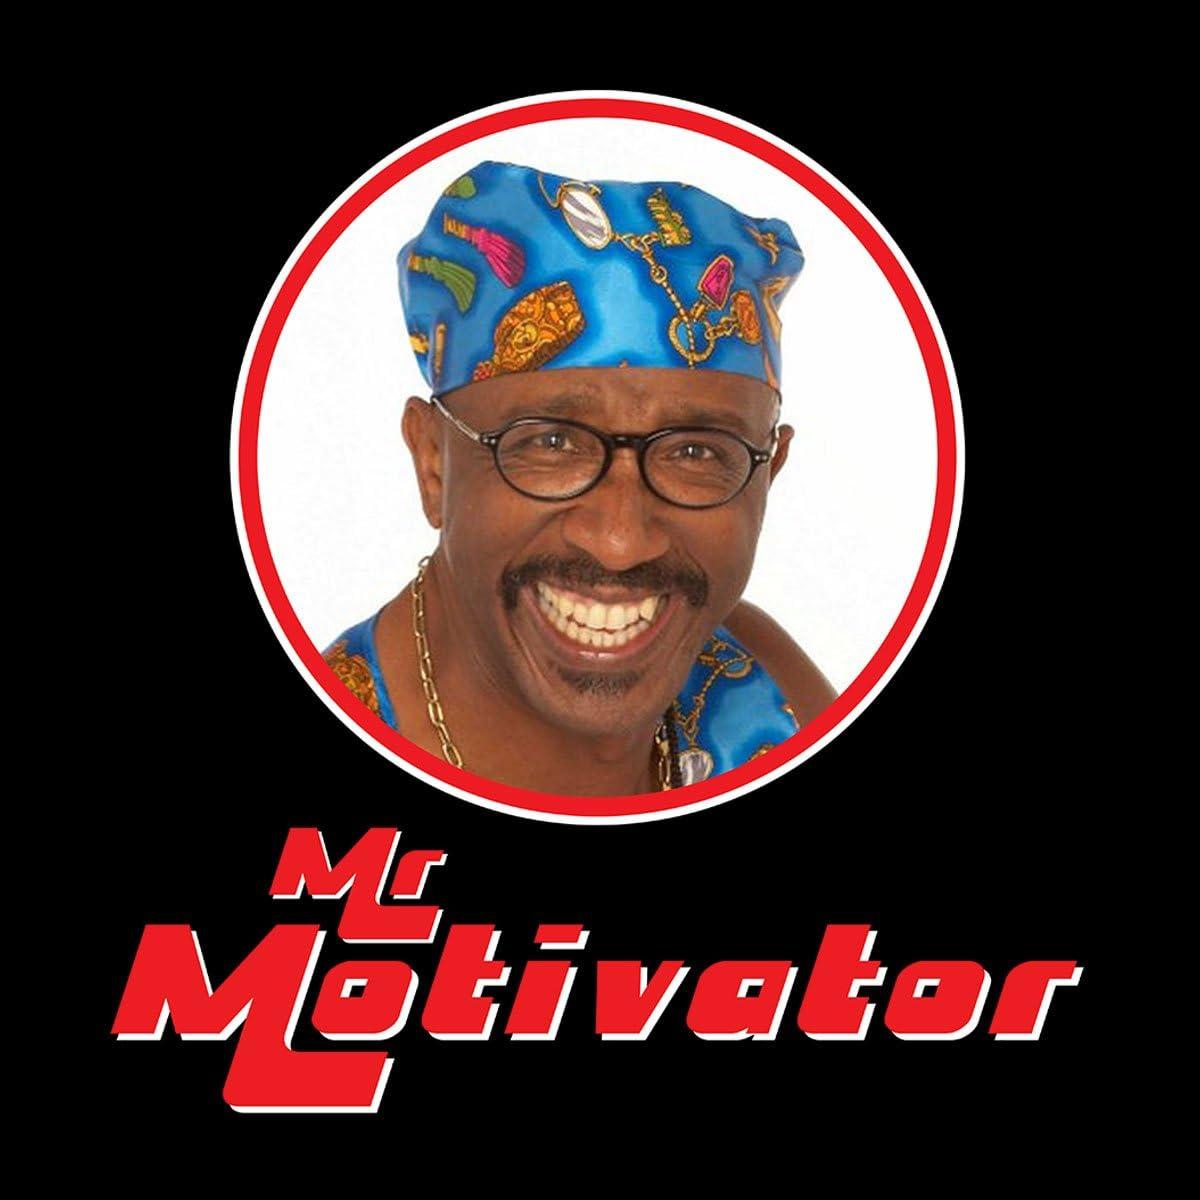 Coto7 Mr Motivator Retro Photo Frame Kids Sweatshirt